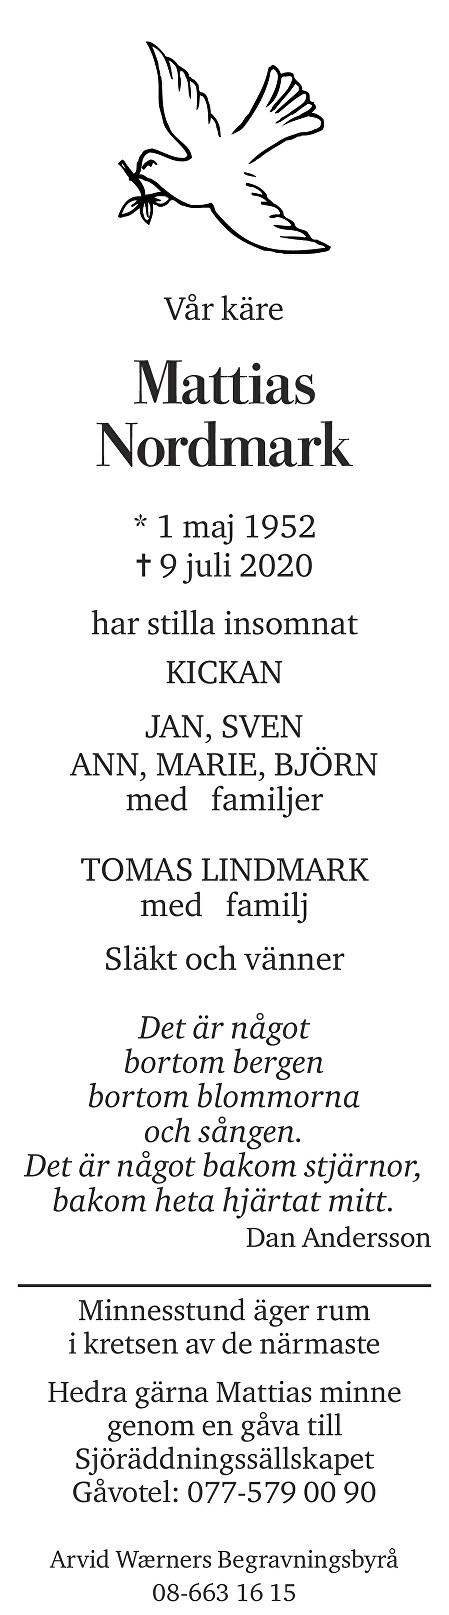 Johan Mattias Nordmark Death notice